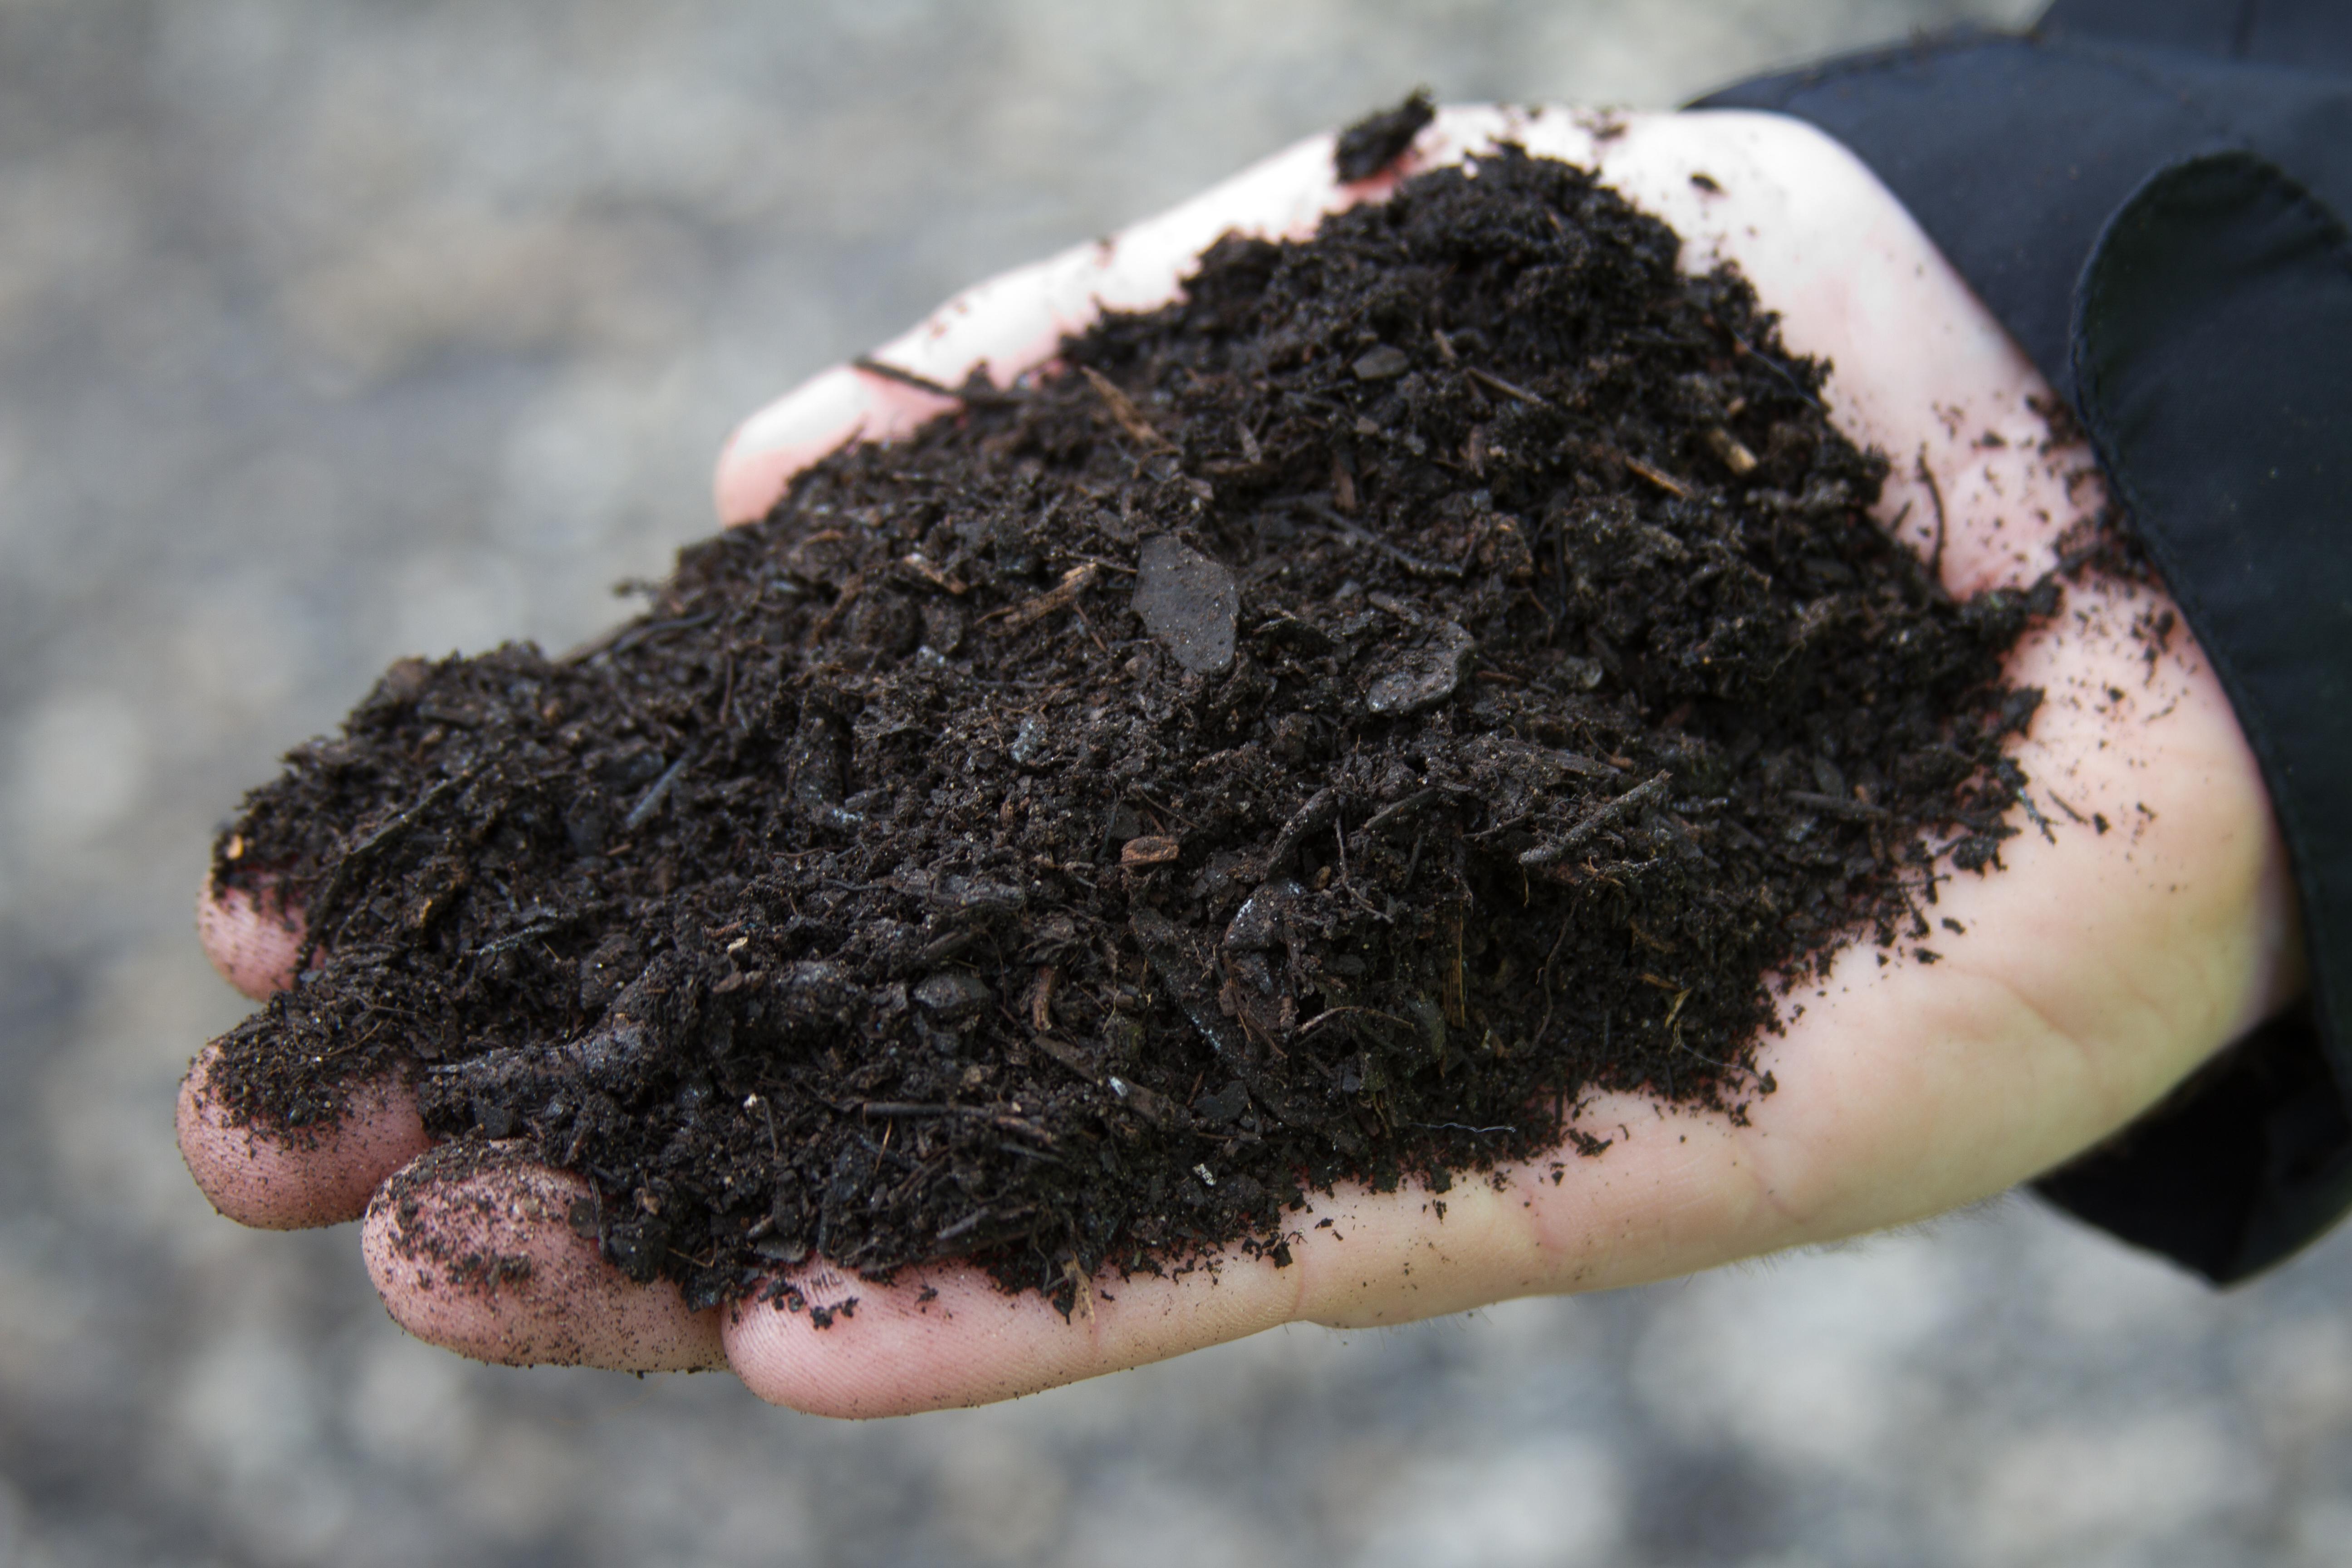 finished compost prince sells it as leaf gro goldjacob fenston wamu